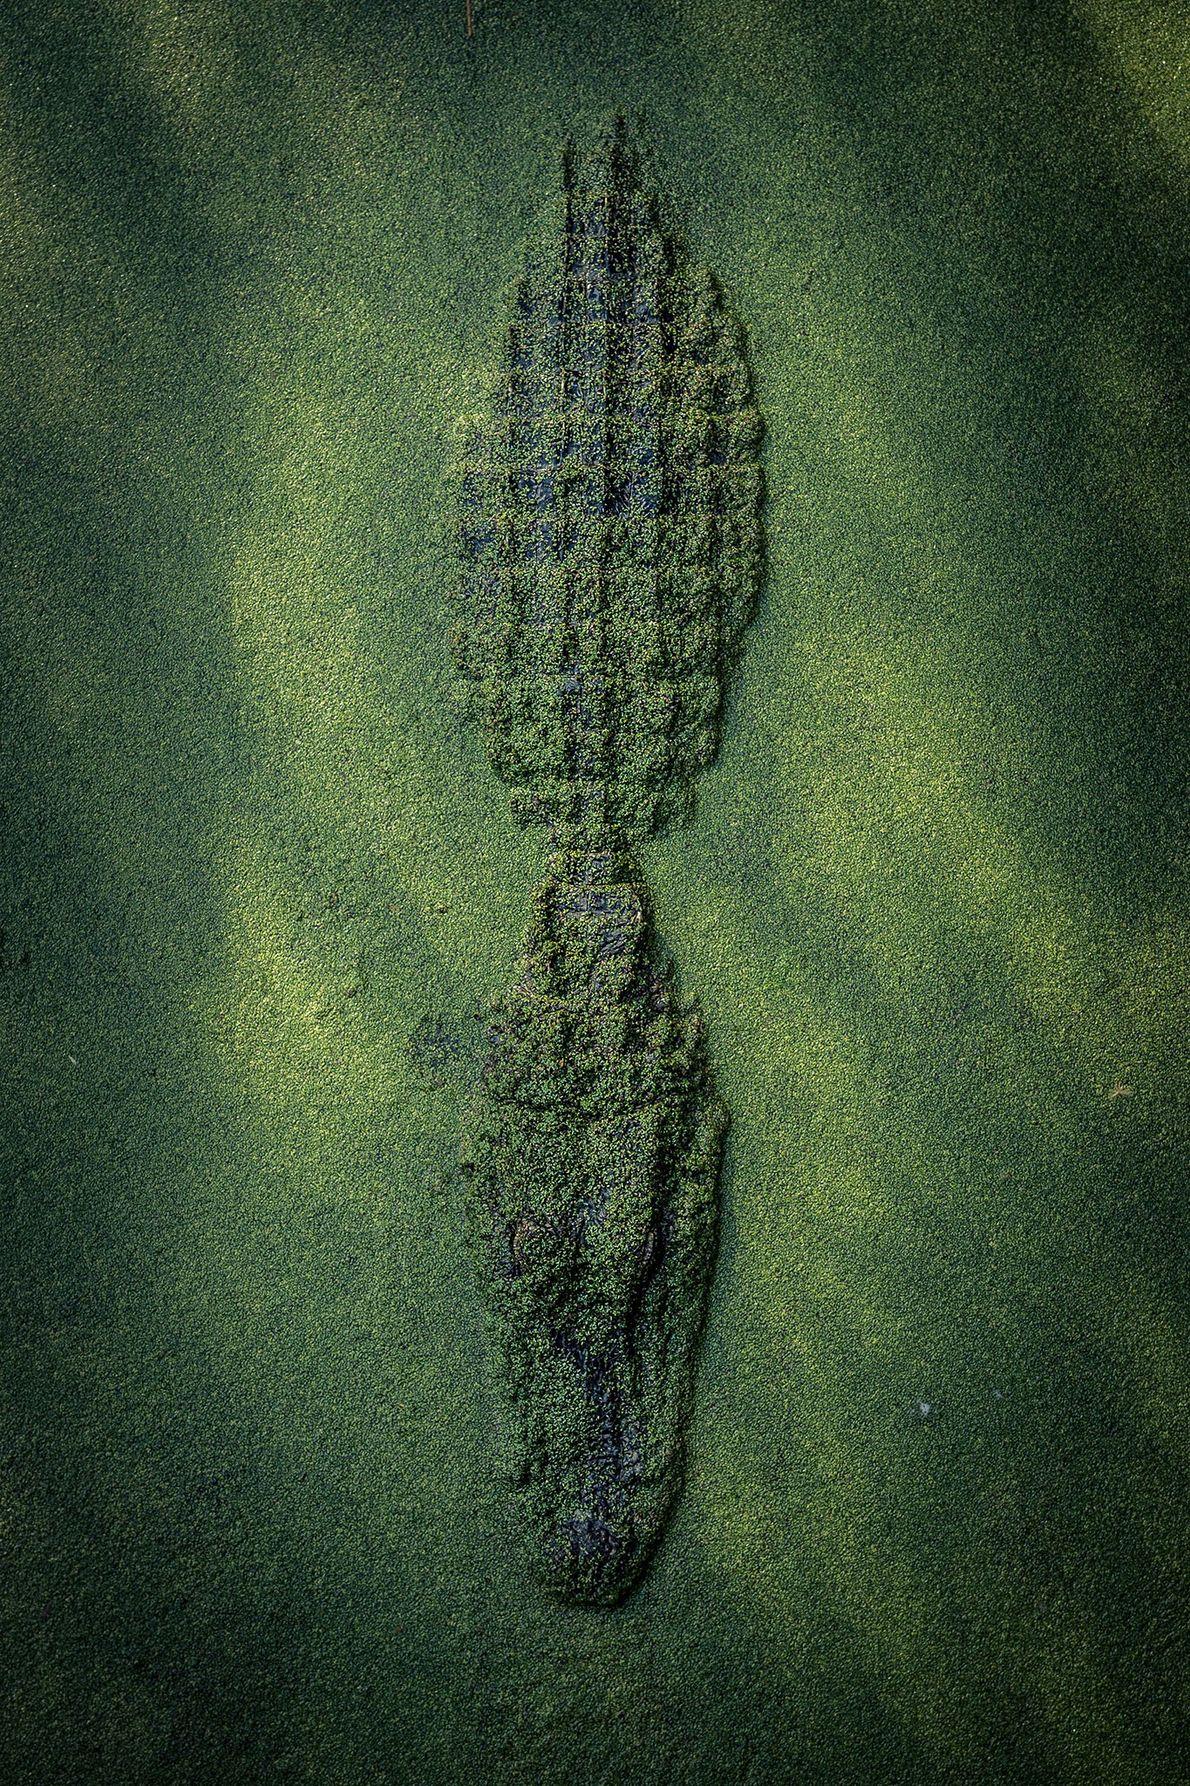 Aligátor alligator